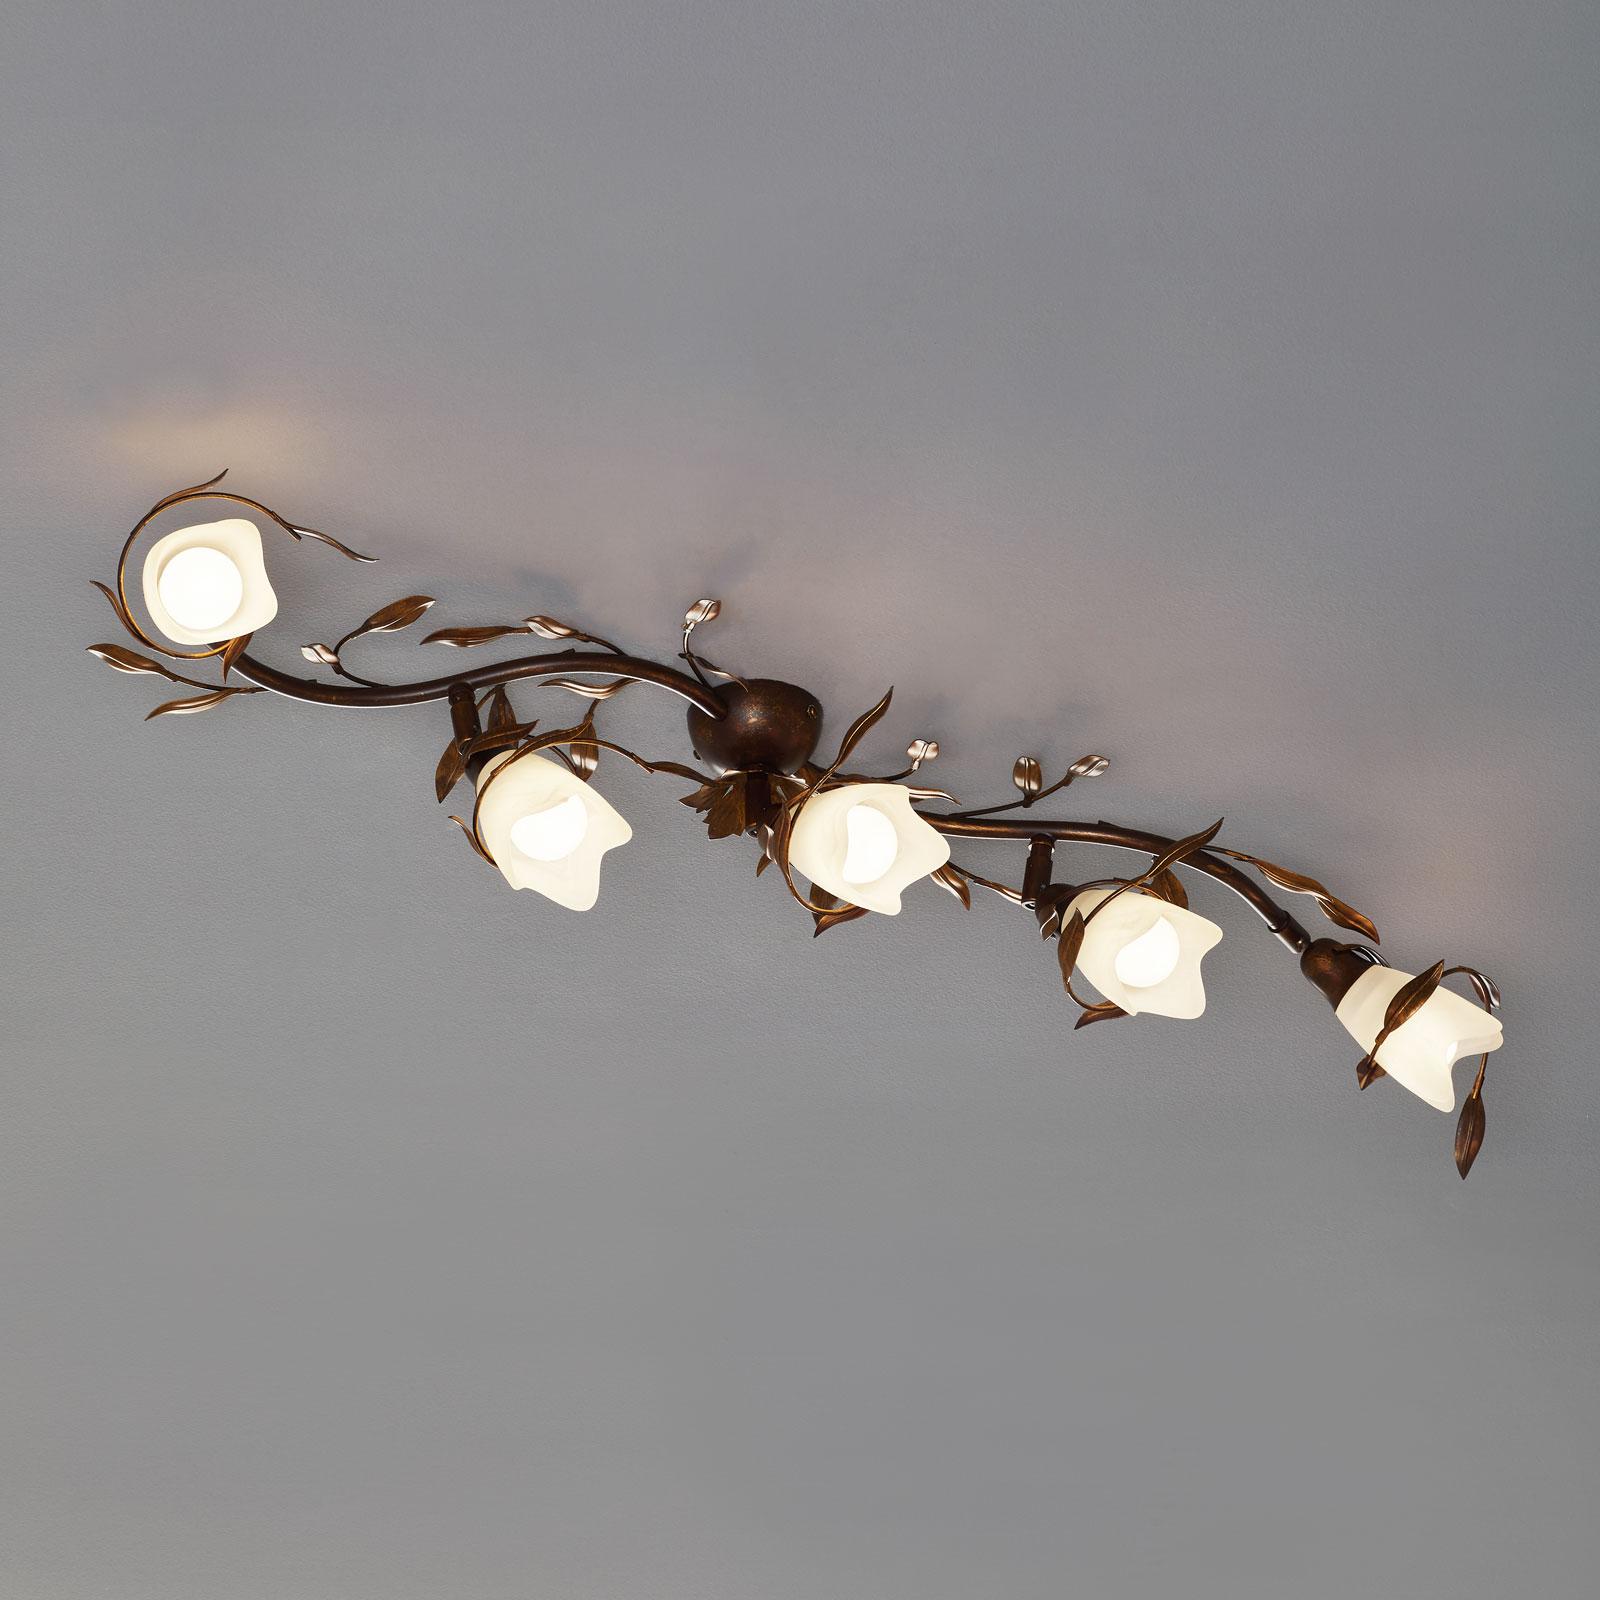 Campana taklampe, 5 lyskilder, buet